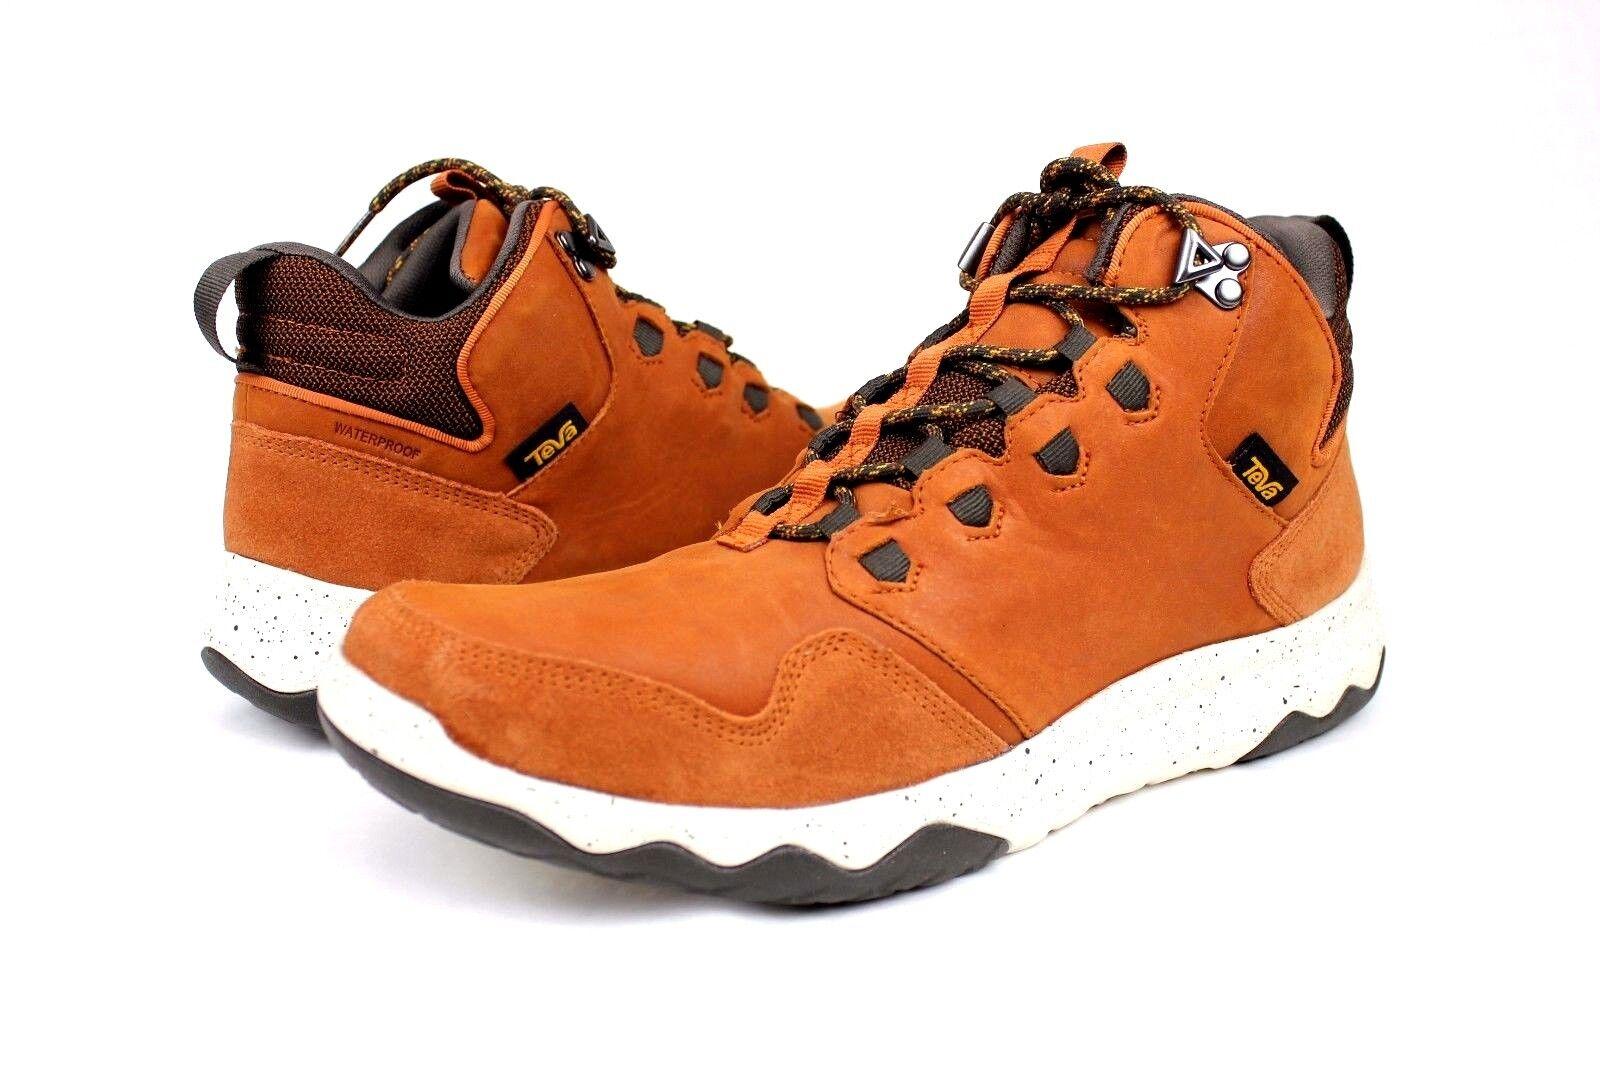 88c2a4101 Buy Teva Arrowood Lux Mid Waterproof Hiker BOOTS Cognac Size 10.5 ...